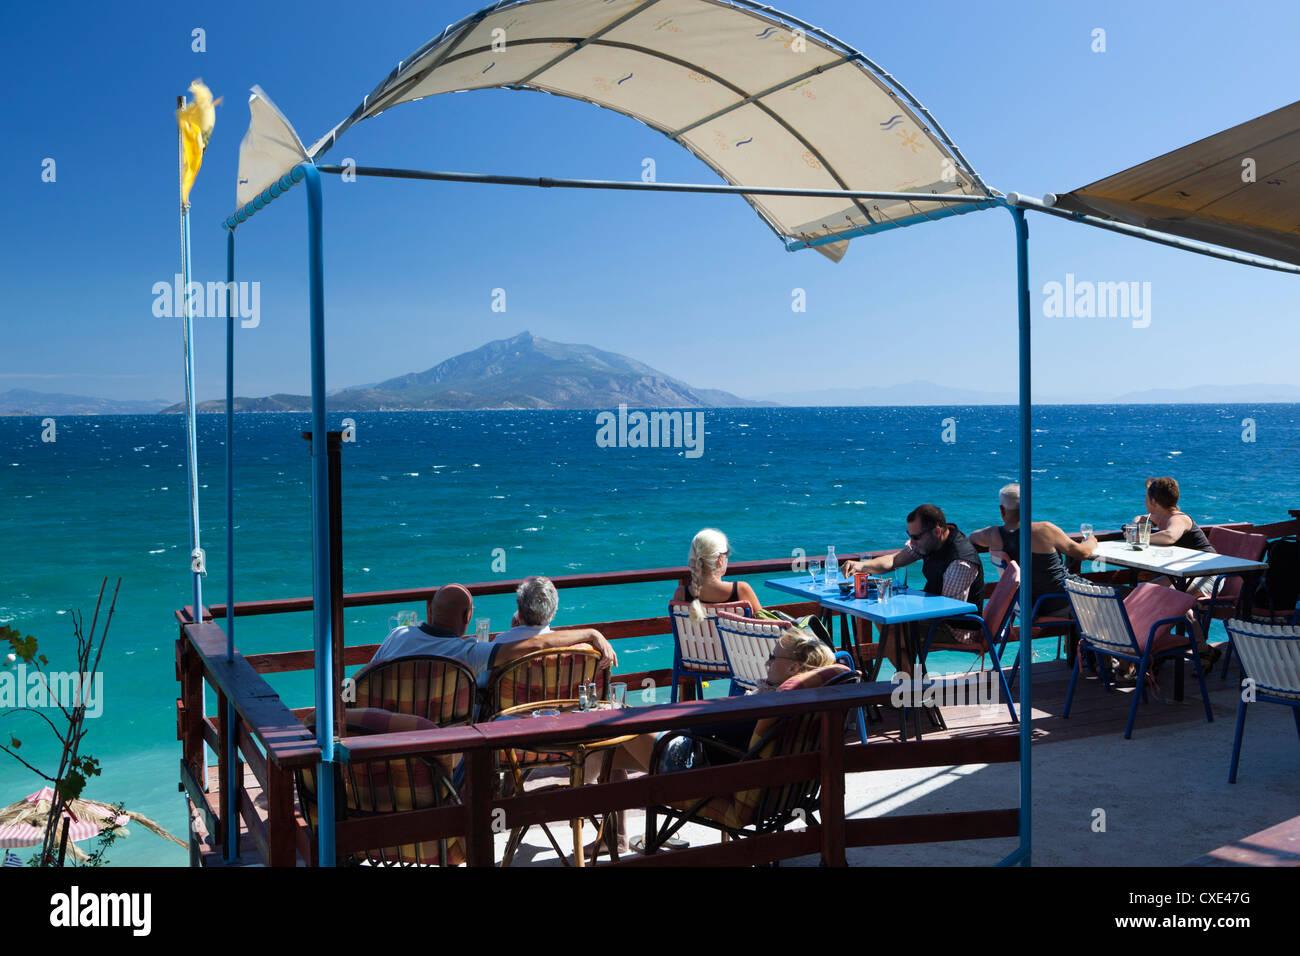 Cafe by sea, Pappa Beach, Ireon, Samos, Aegean Islands, Greece - Stock Image